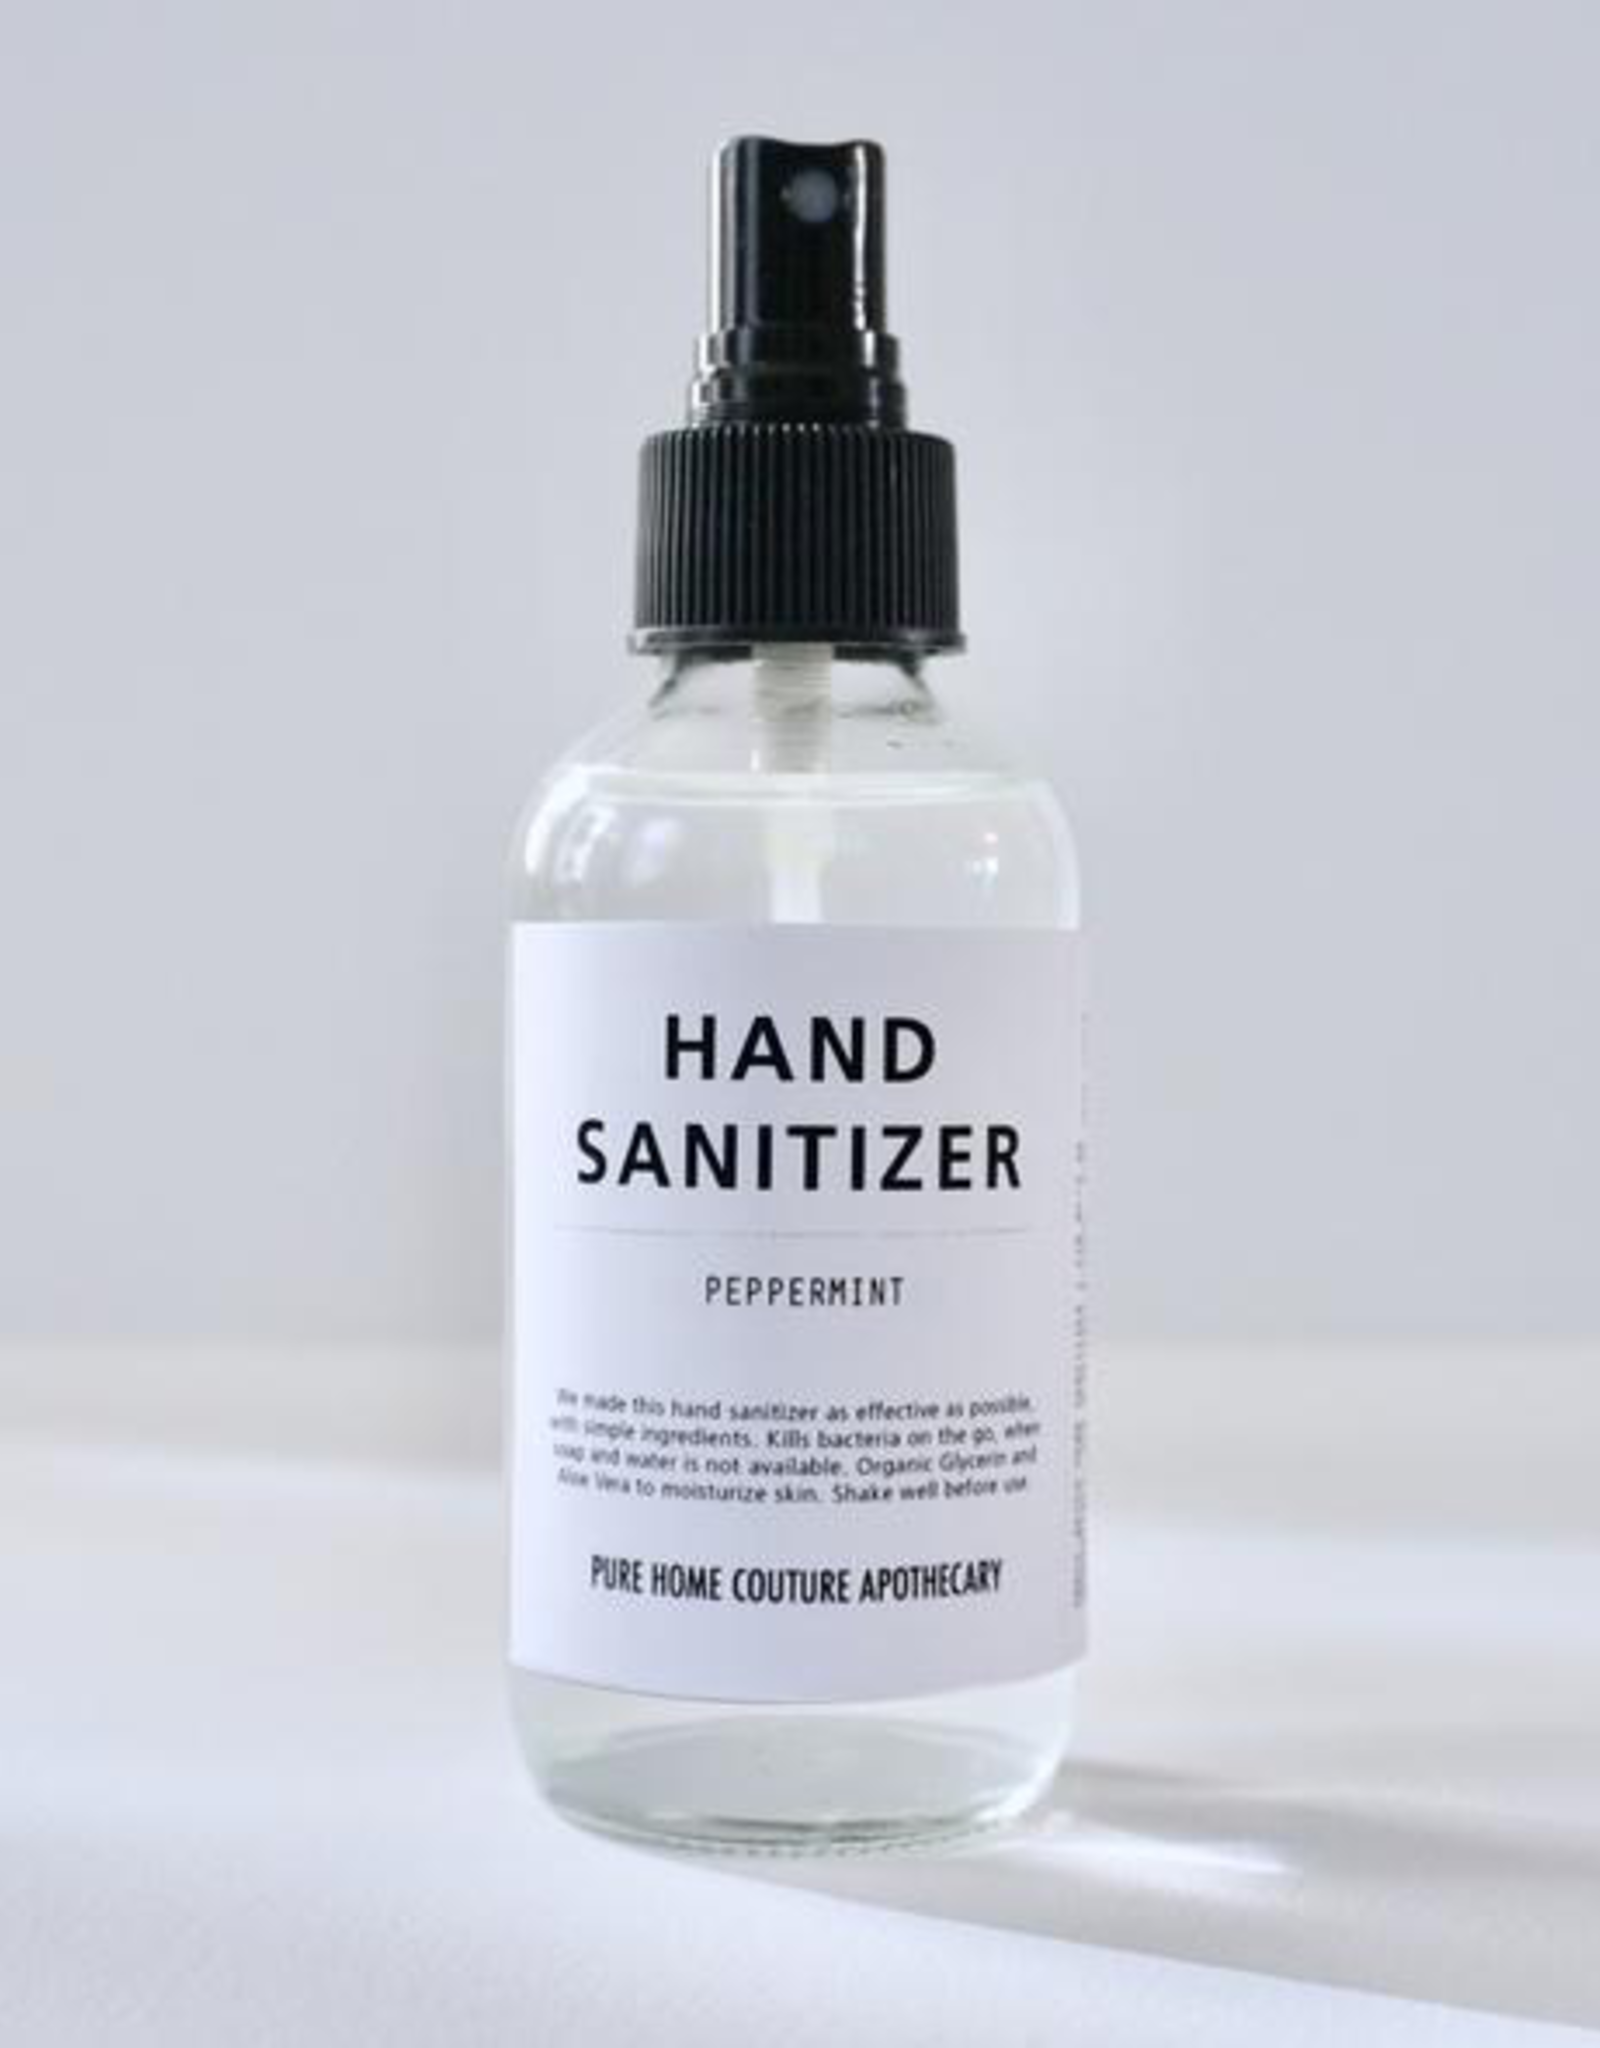 Peppermint Hand Sanitizer